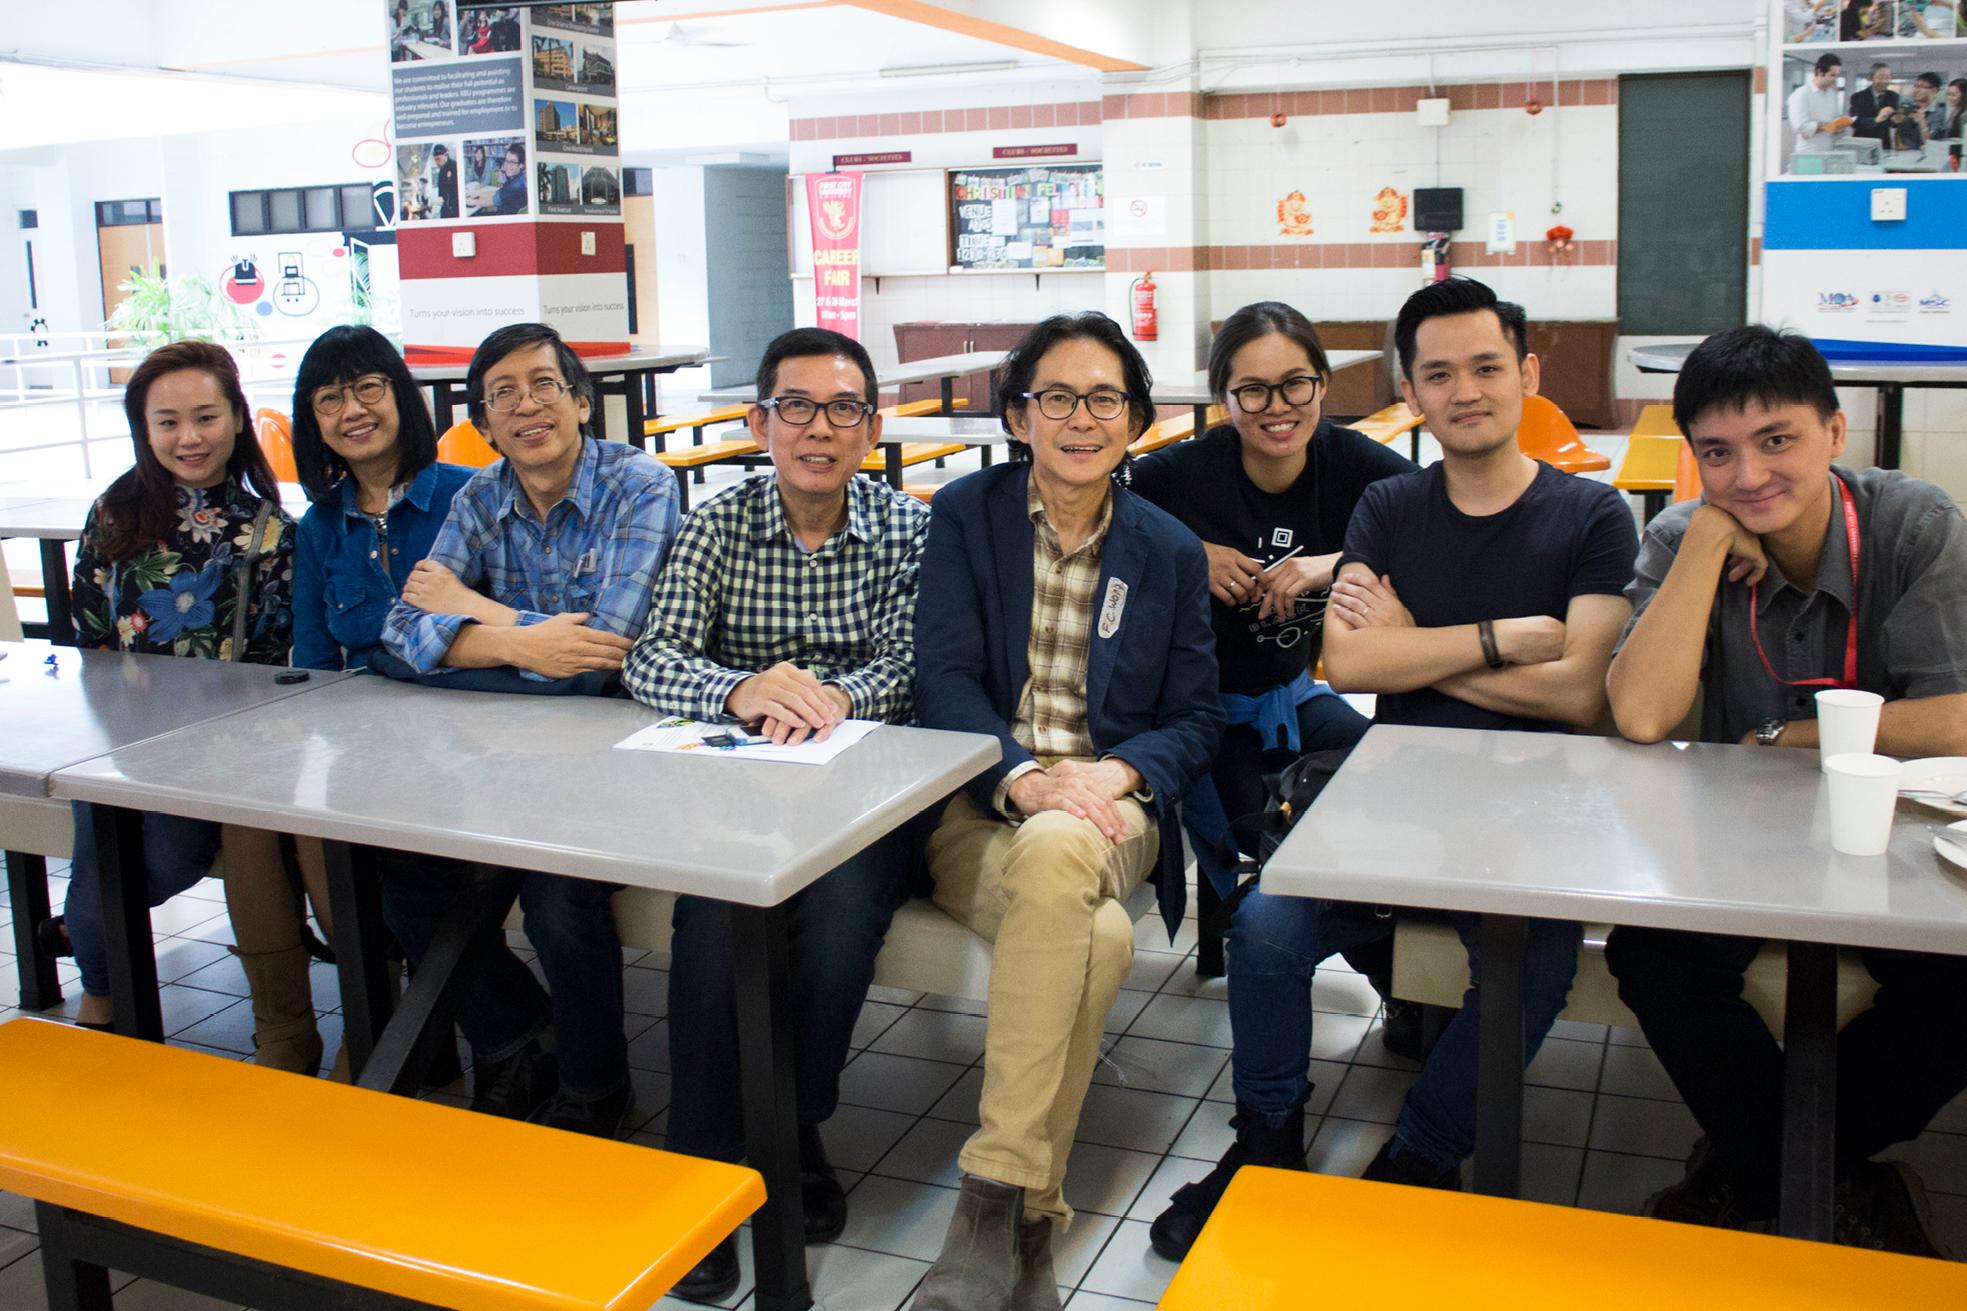 whwWeb_About_whw_Activities_wREGA AGM 2017_Group at Canteen.jpg